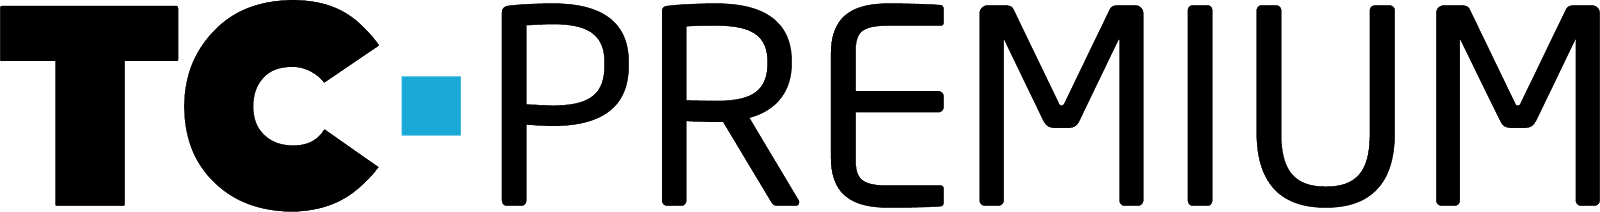 The Branding Source Brazil S Telecine Channels Get New Logo